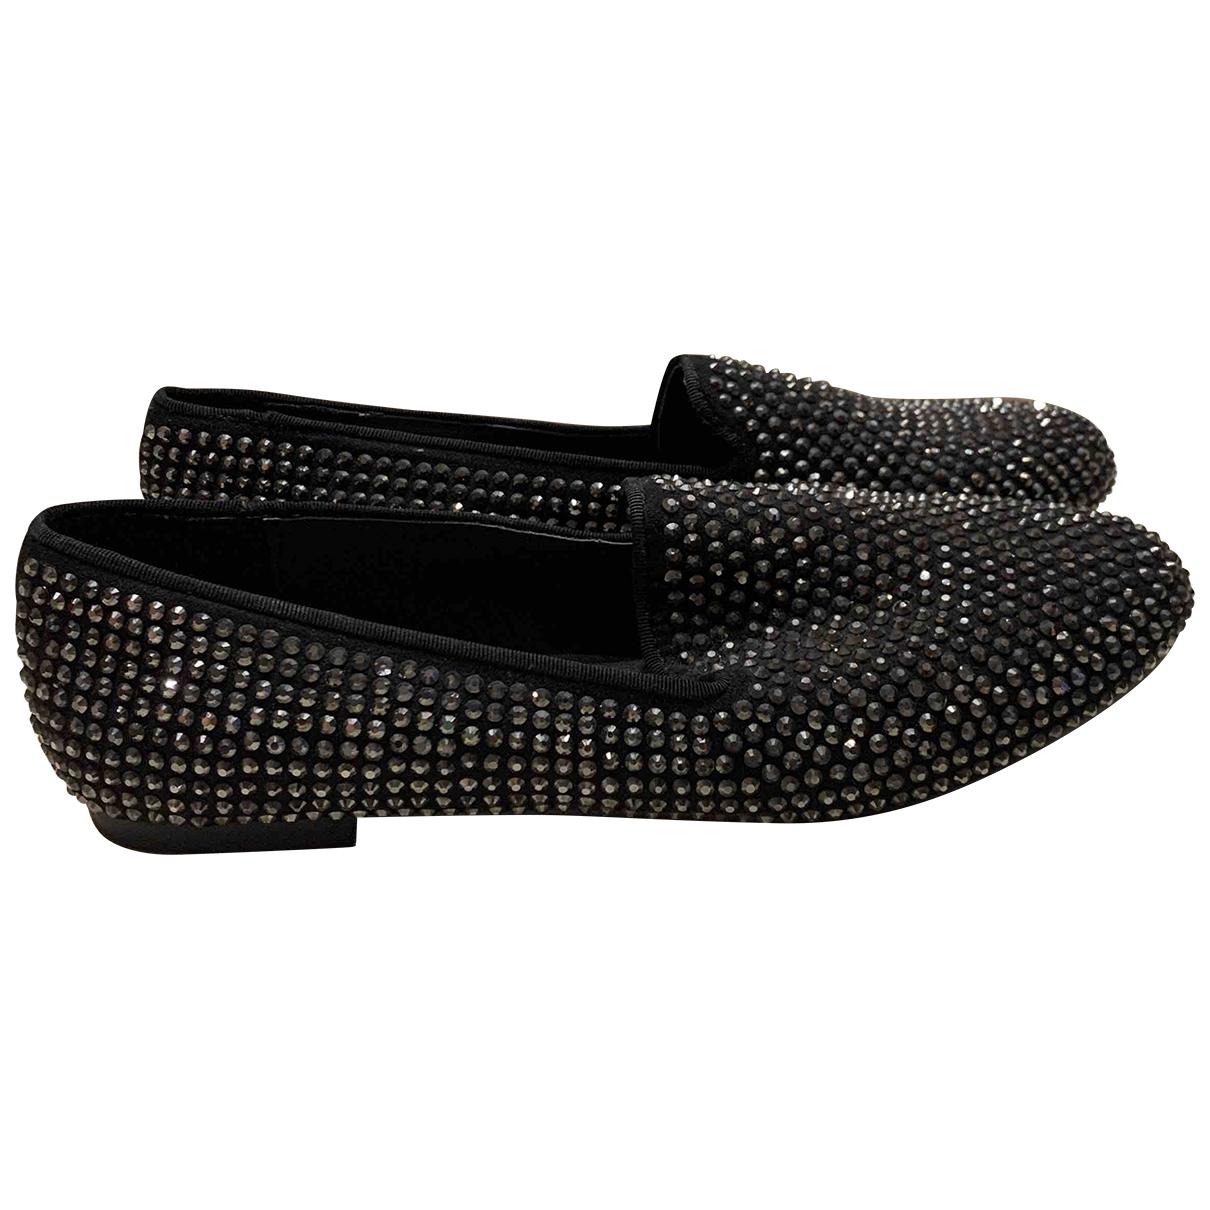 Steve Madden \N Cloth Flats for Women 7.5 US